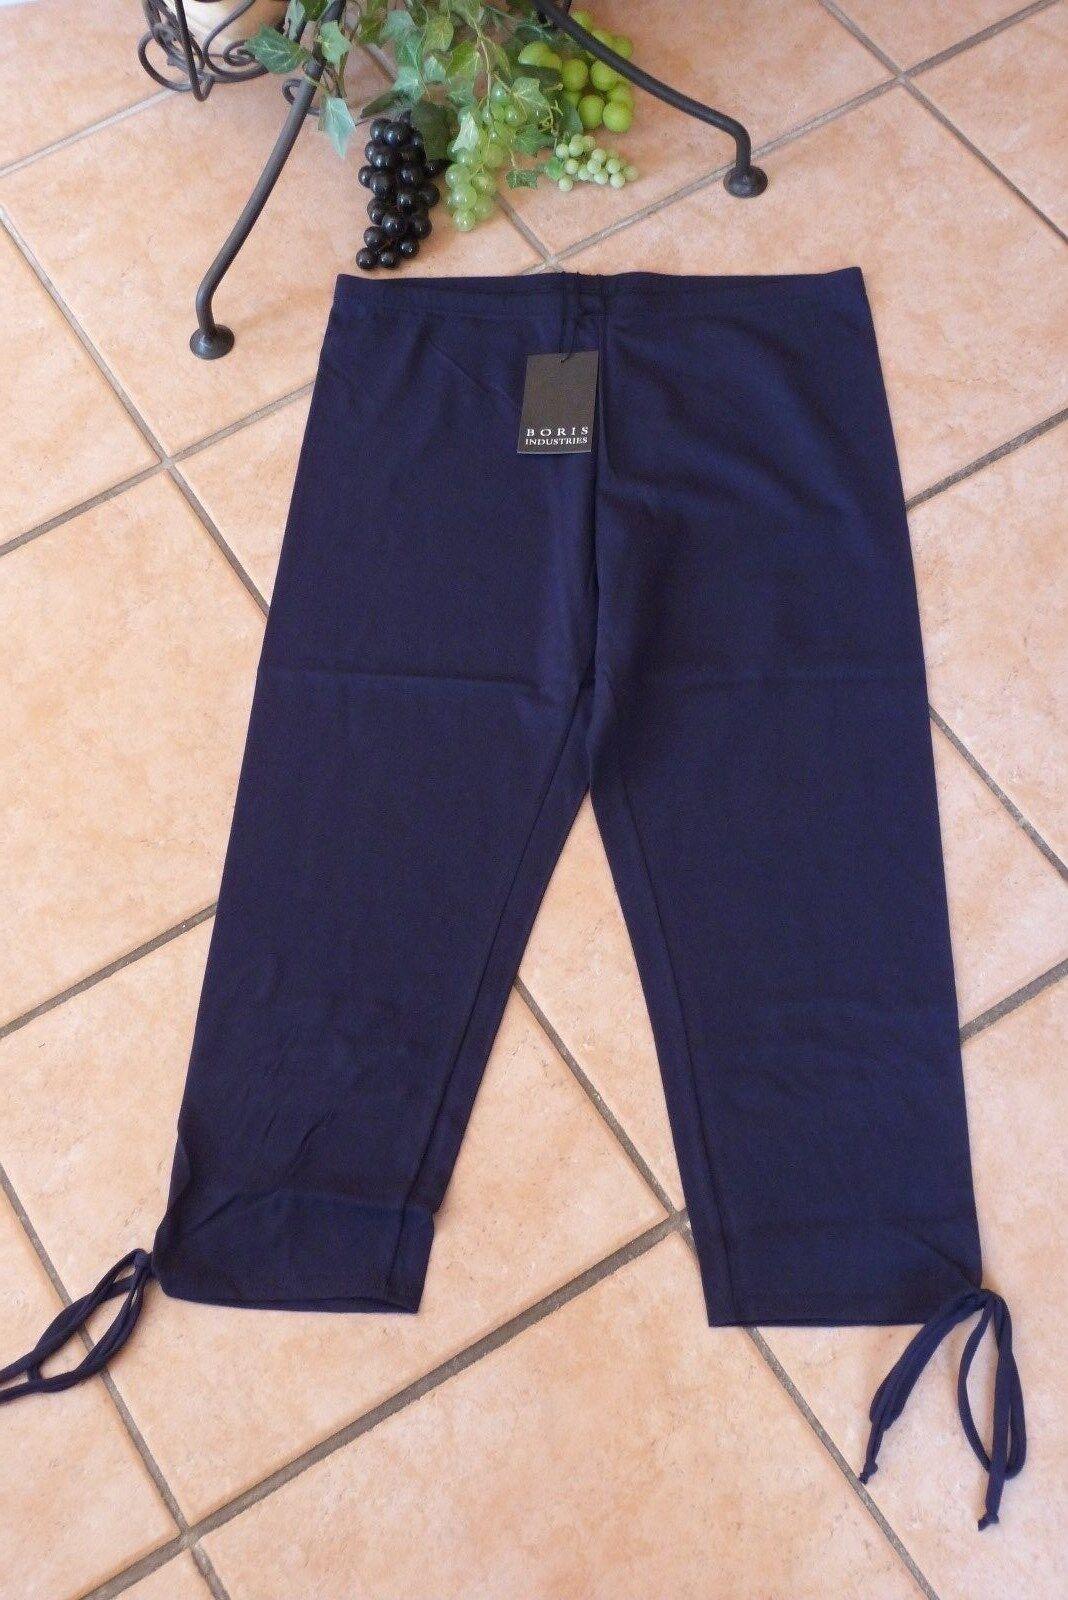 BORIS INDUSTRIES 7 8 Leggings 44 46 (3) NEU marineblue Bänder LAGENLOOK Stretch